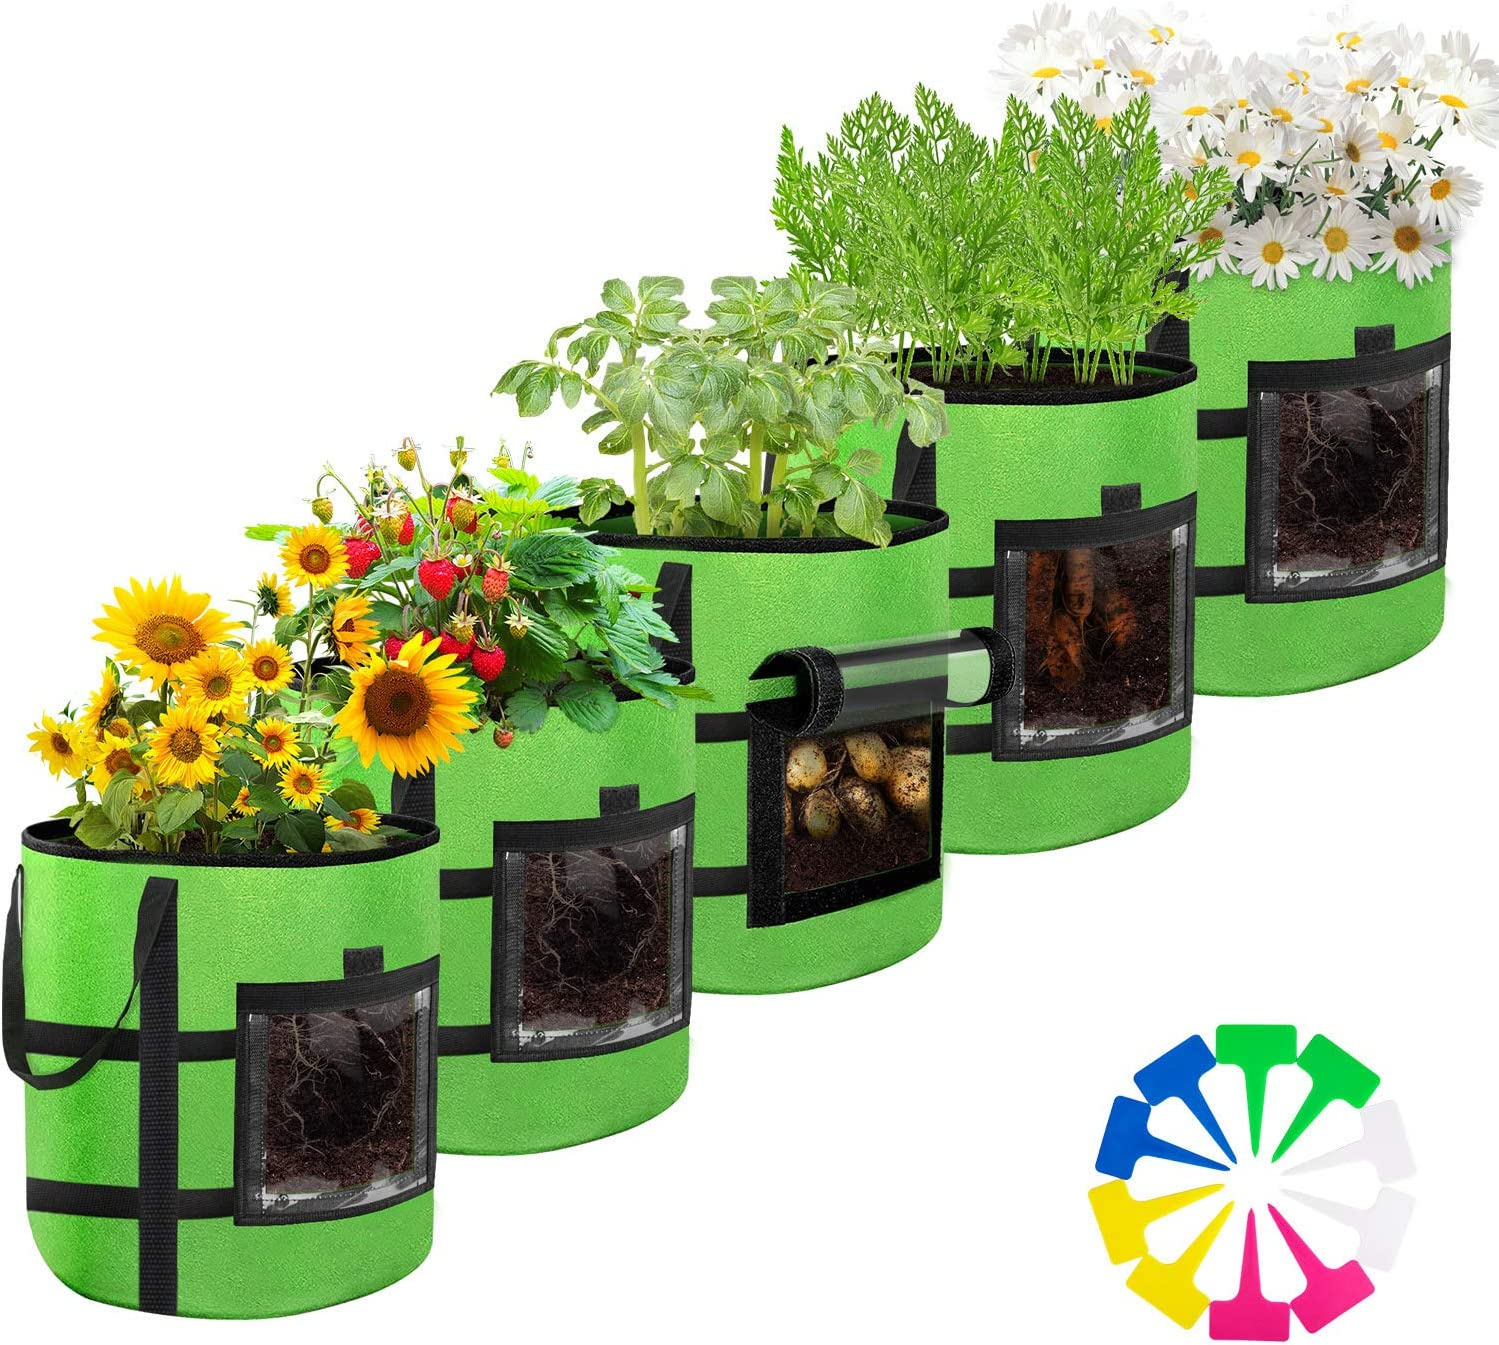 10 Gallon Plant Grow Bags, 5-Pack Potato Grow Bags Reusable with Planter Label 12pcs, Access Flap & Reinforced Handle, Non-Woven Fabric Pots Container for Nursery Garden vegetables Fruit Flower(Green)